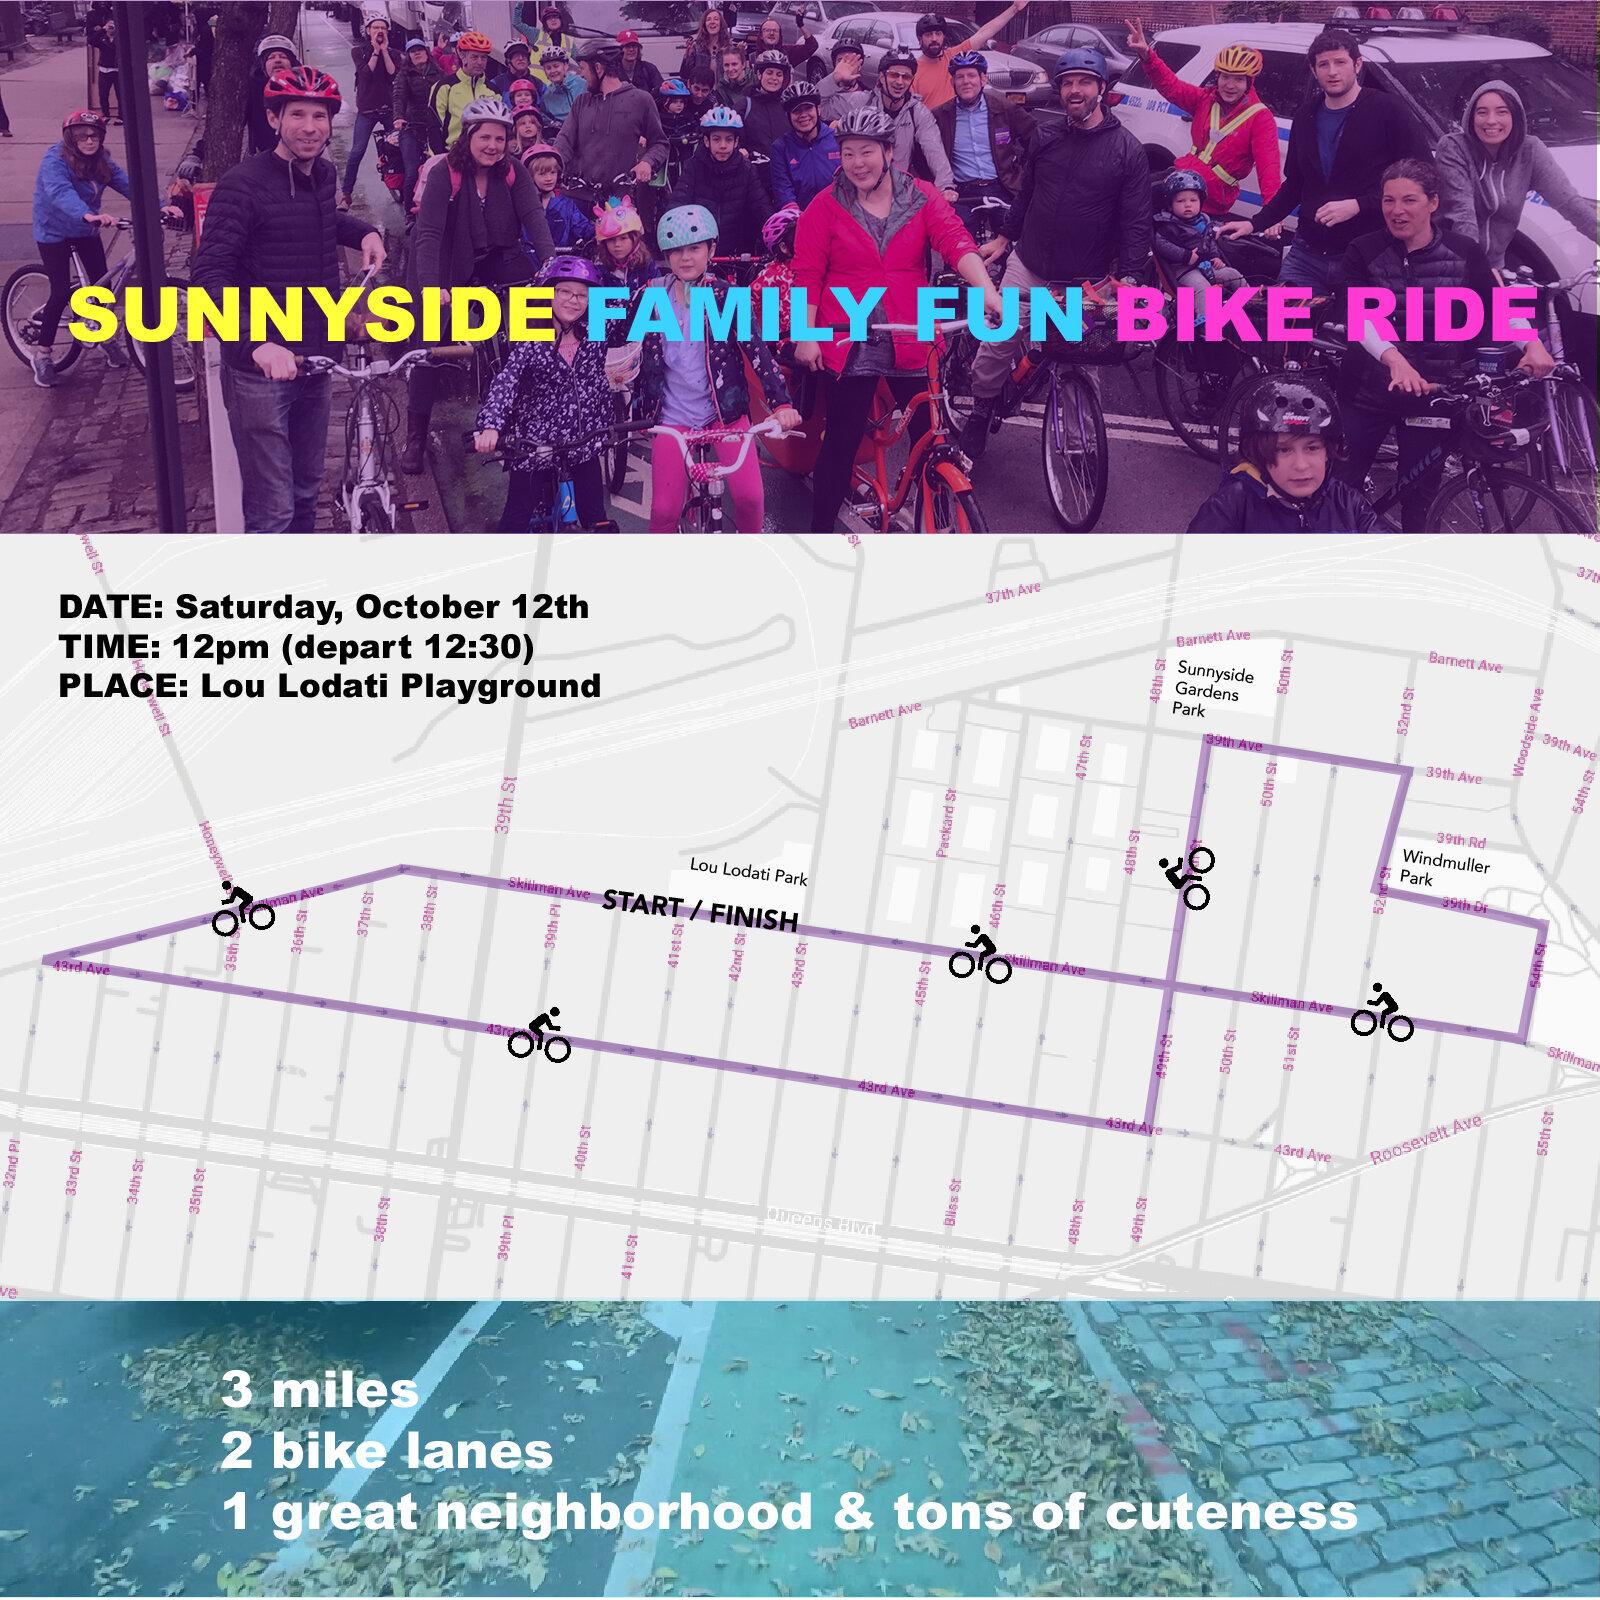 The Sunnyside Family Fun Bike Ride returns to the neighborhood this Saturday. Image courtesy of Sunnyside Family Fun Bike Ride.